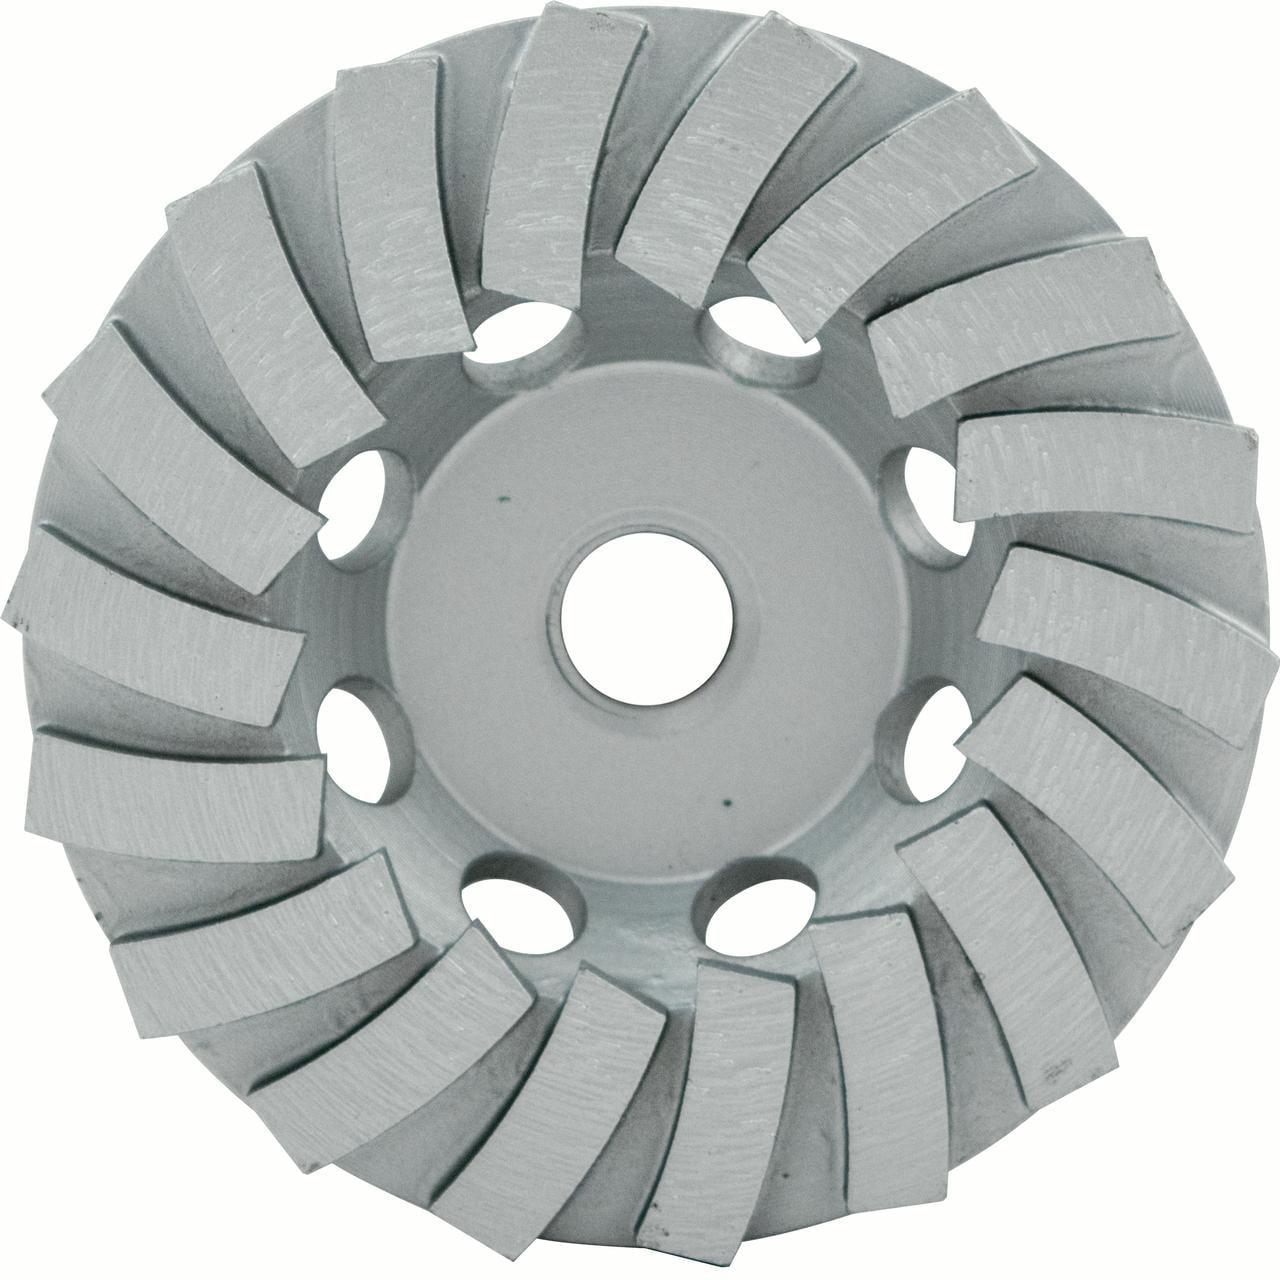 "4"" Spp Series Segmented Turbo Cup Wheel, Wet/Dry, 7/8""-5/8"", 18 Segments"